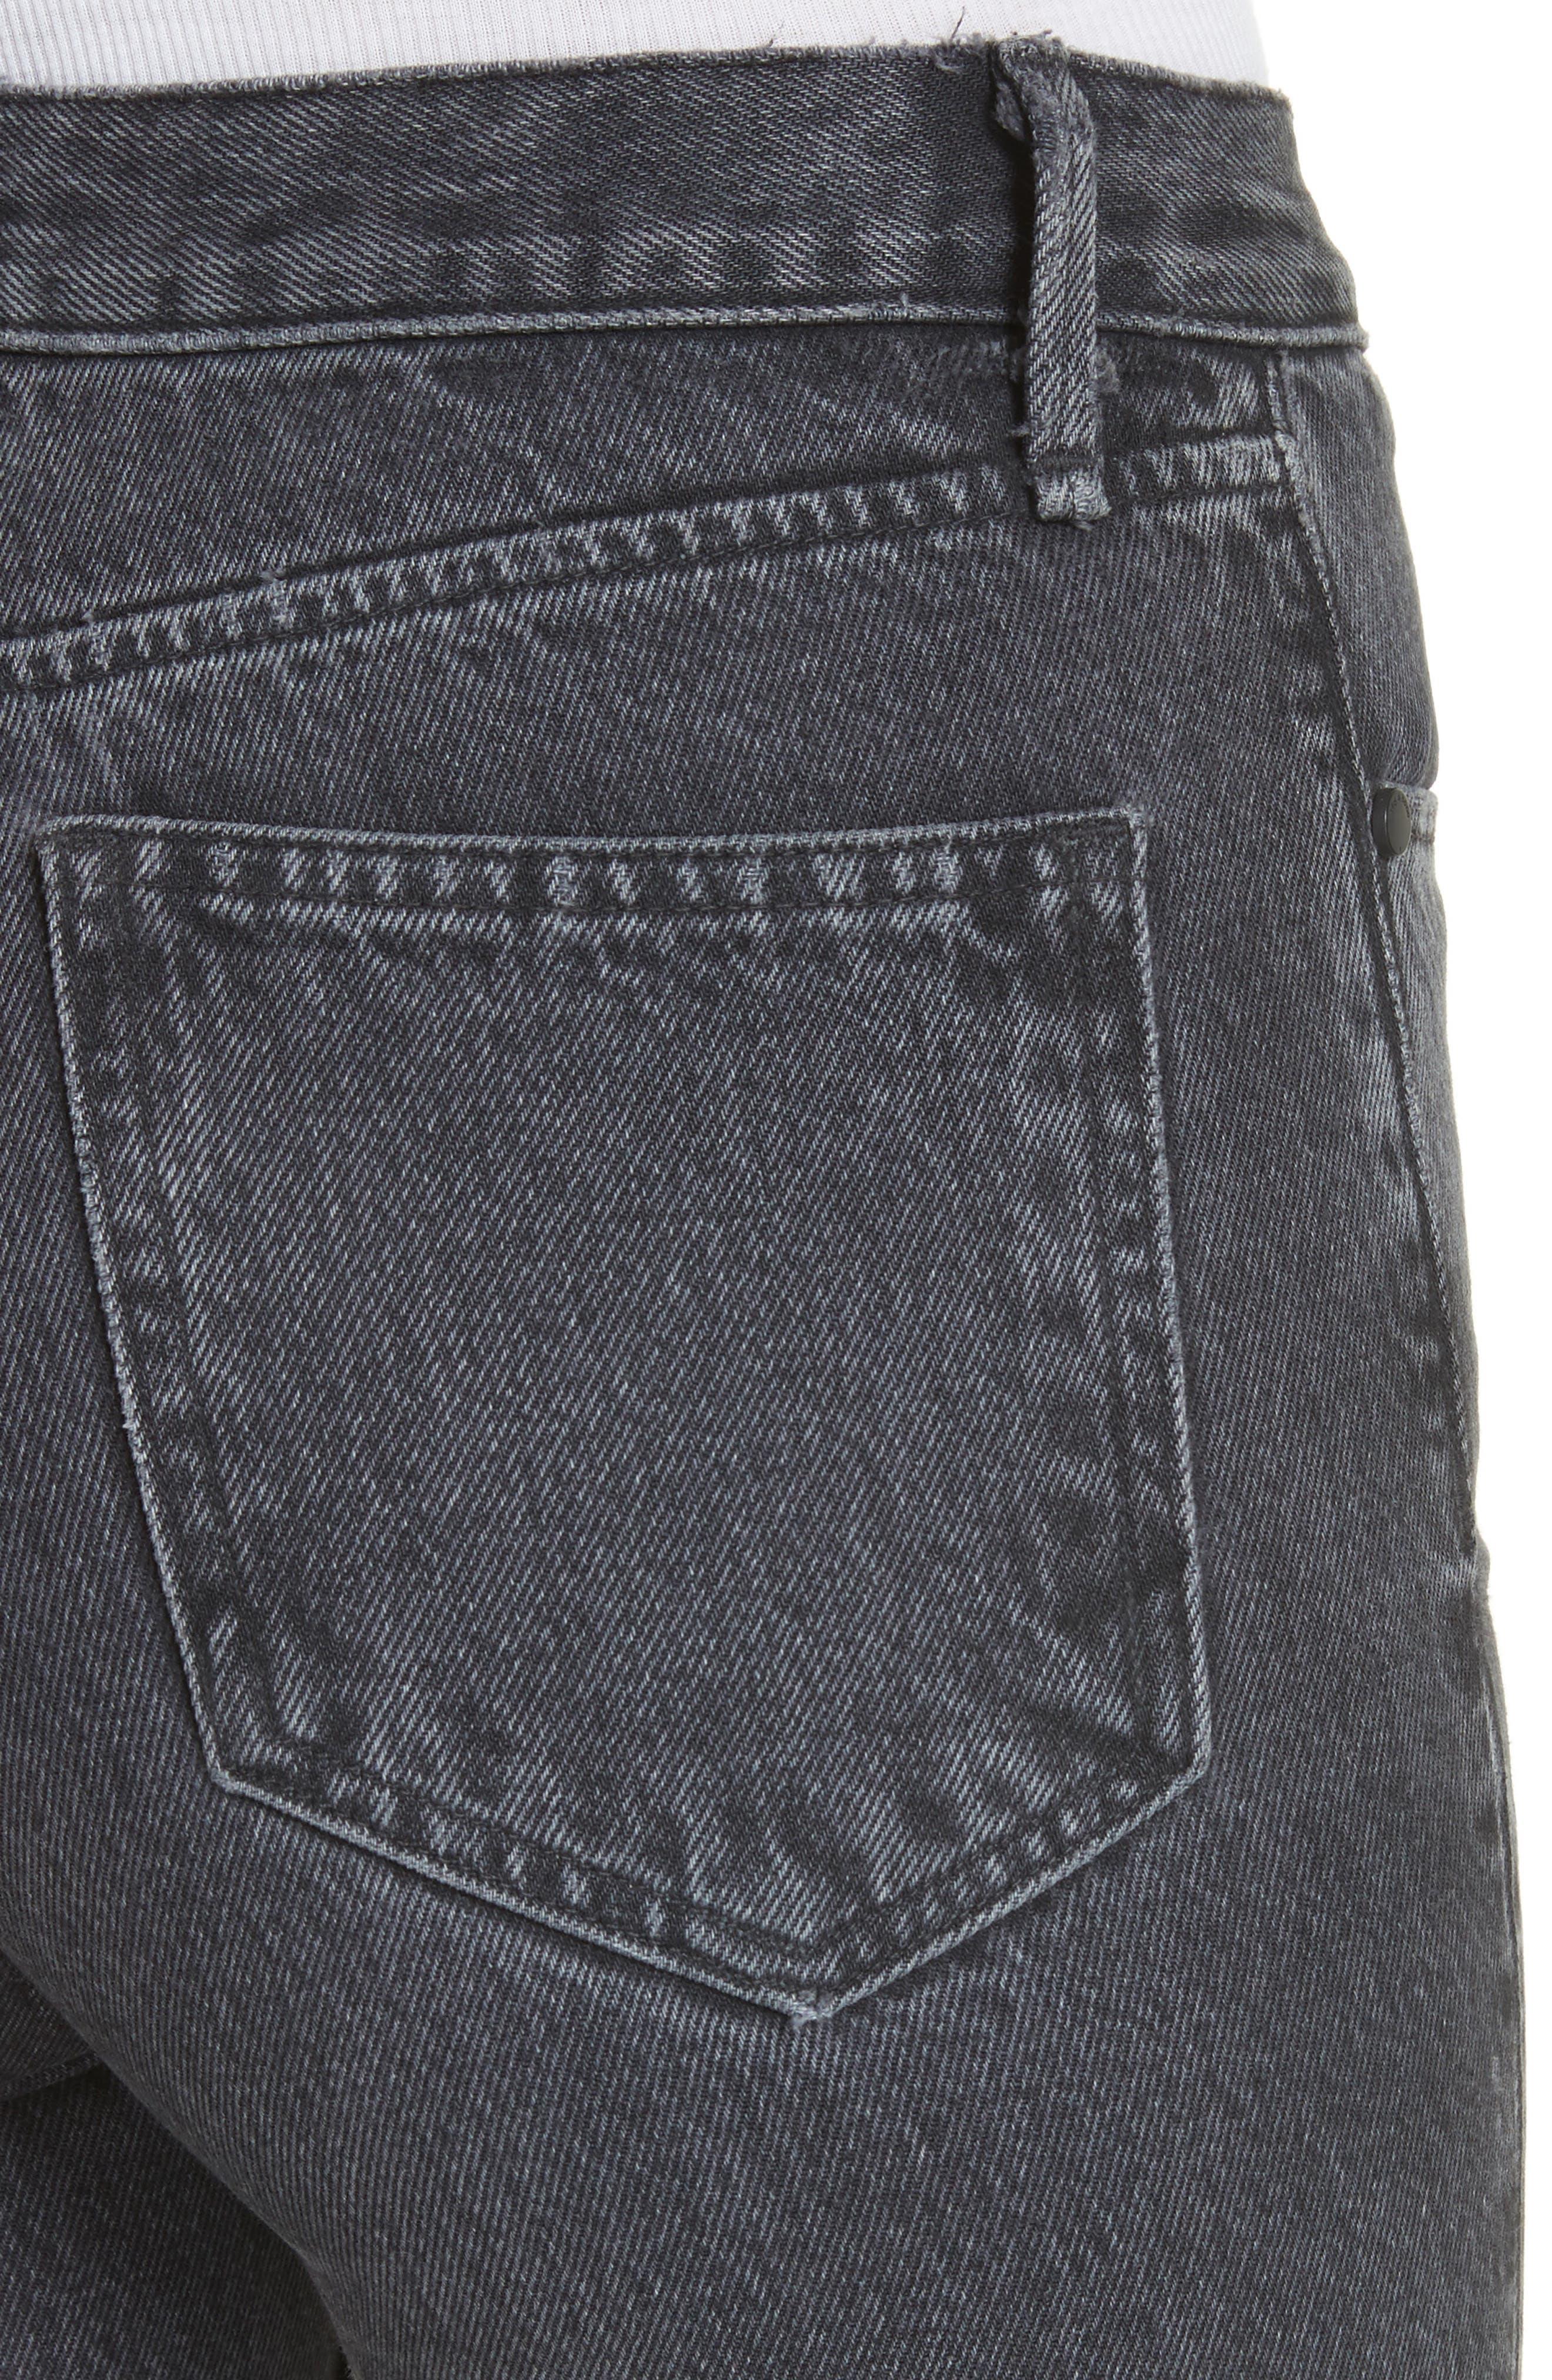 Dylan High Waist Crop Kick Flare Jeans,                             Alternate thumbnail 4, color,                             Grey Kuro